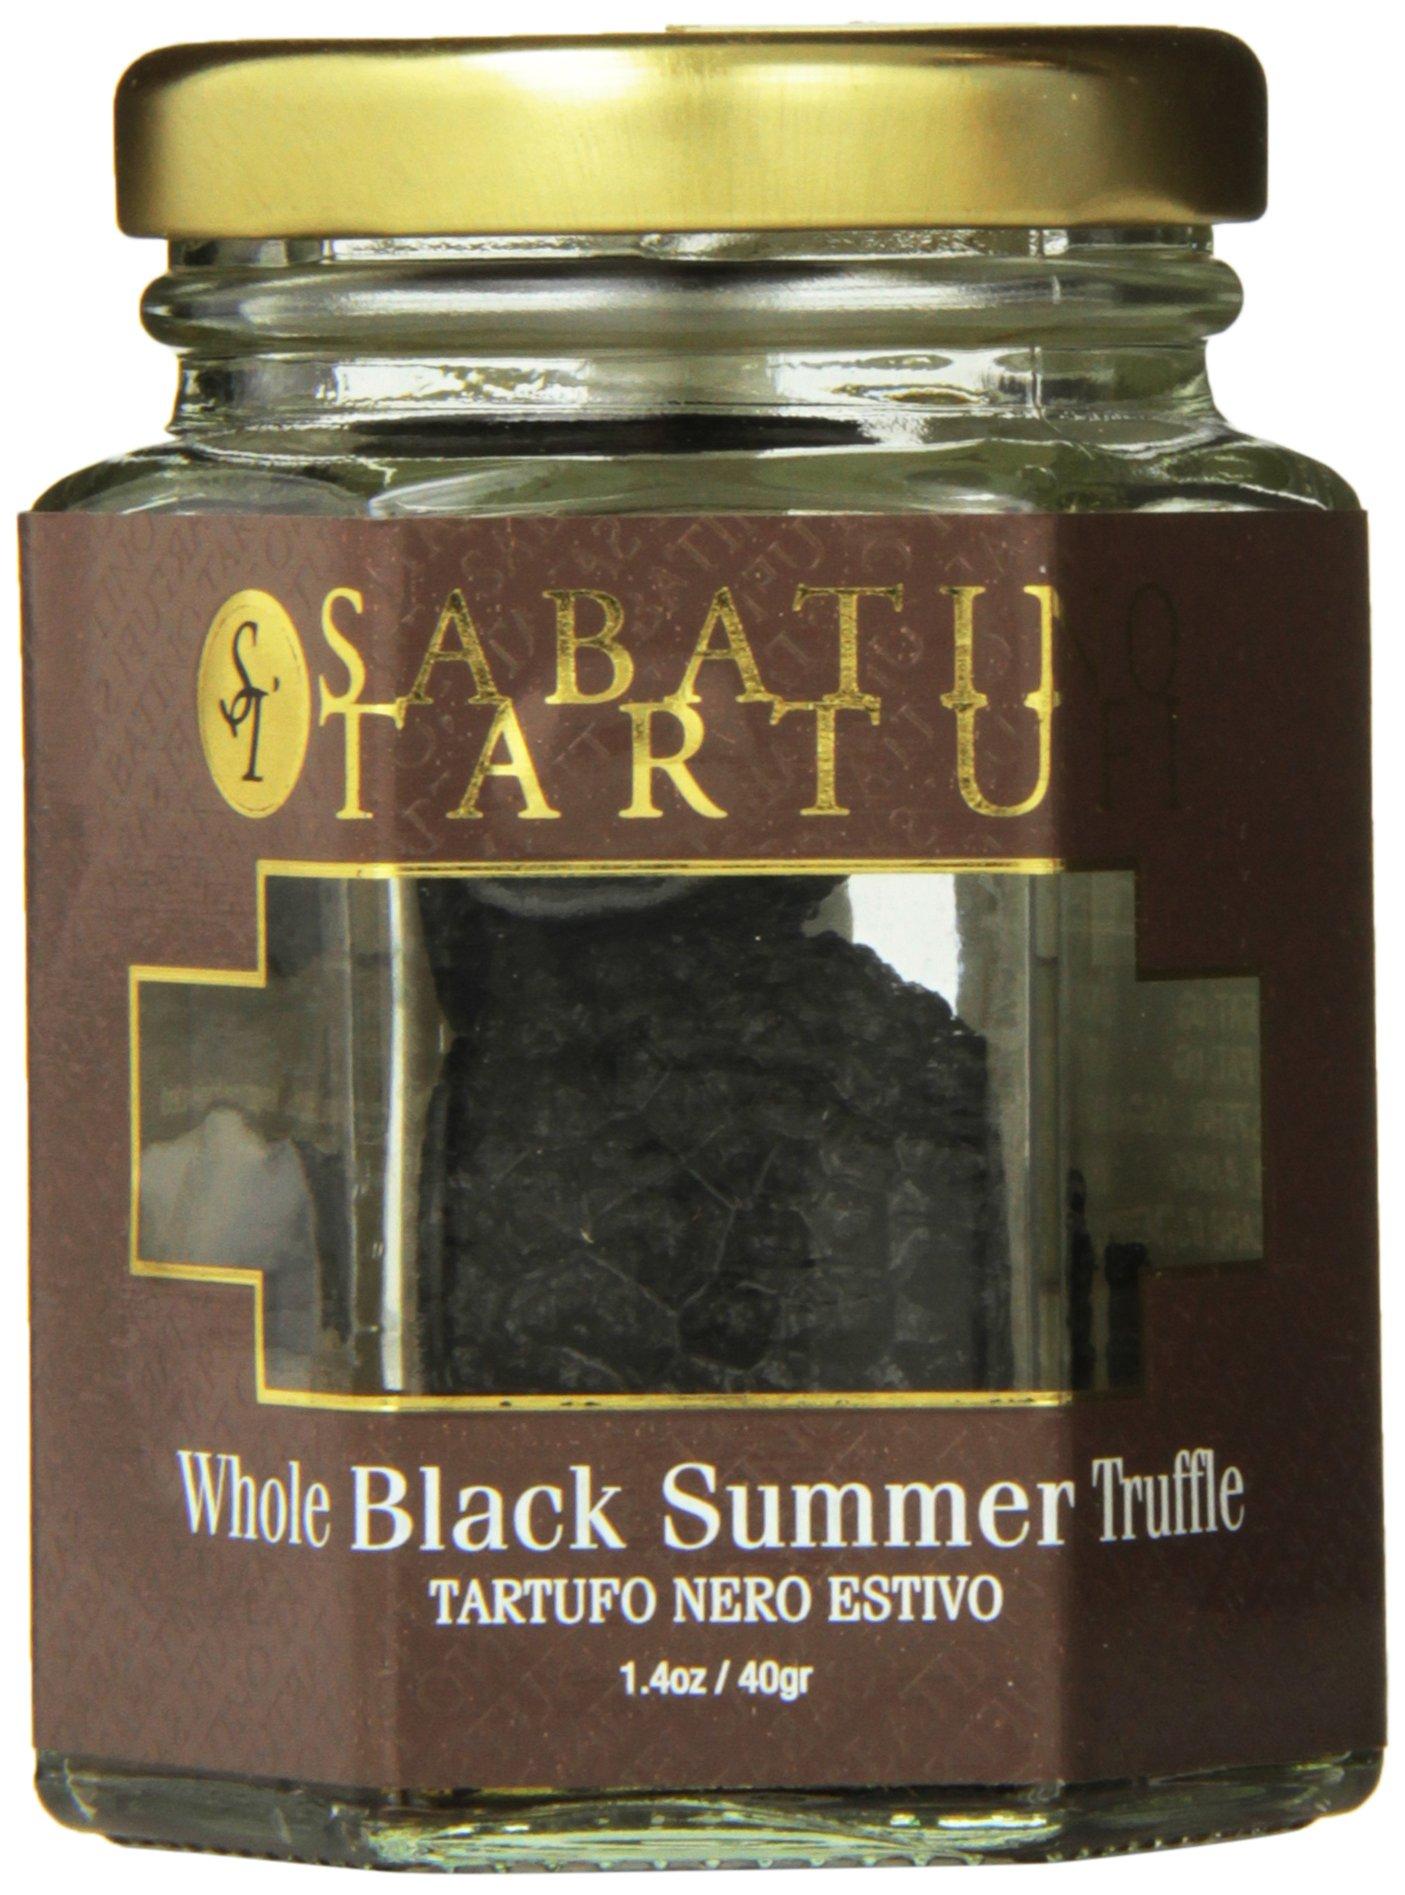 Sabatino Tartufi Whole Black Summer Truffle, 1.4 Ounce by Sabatino